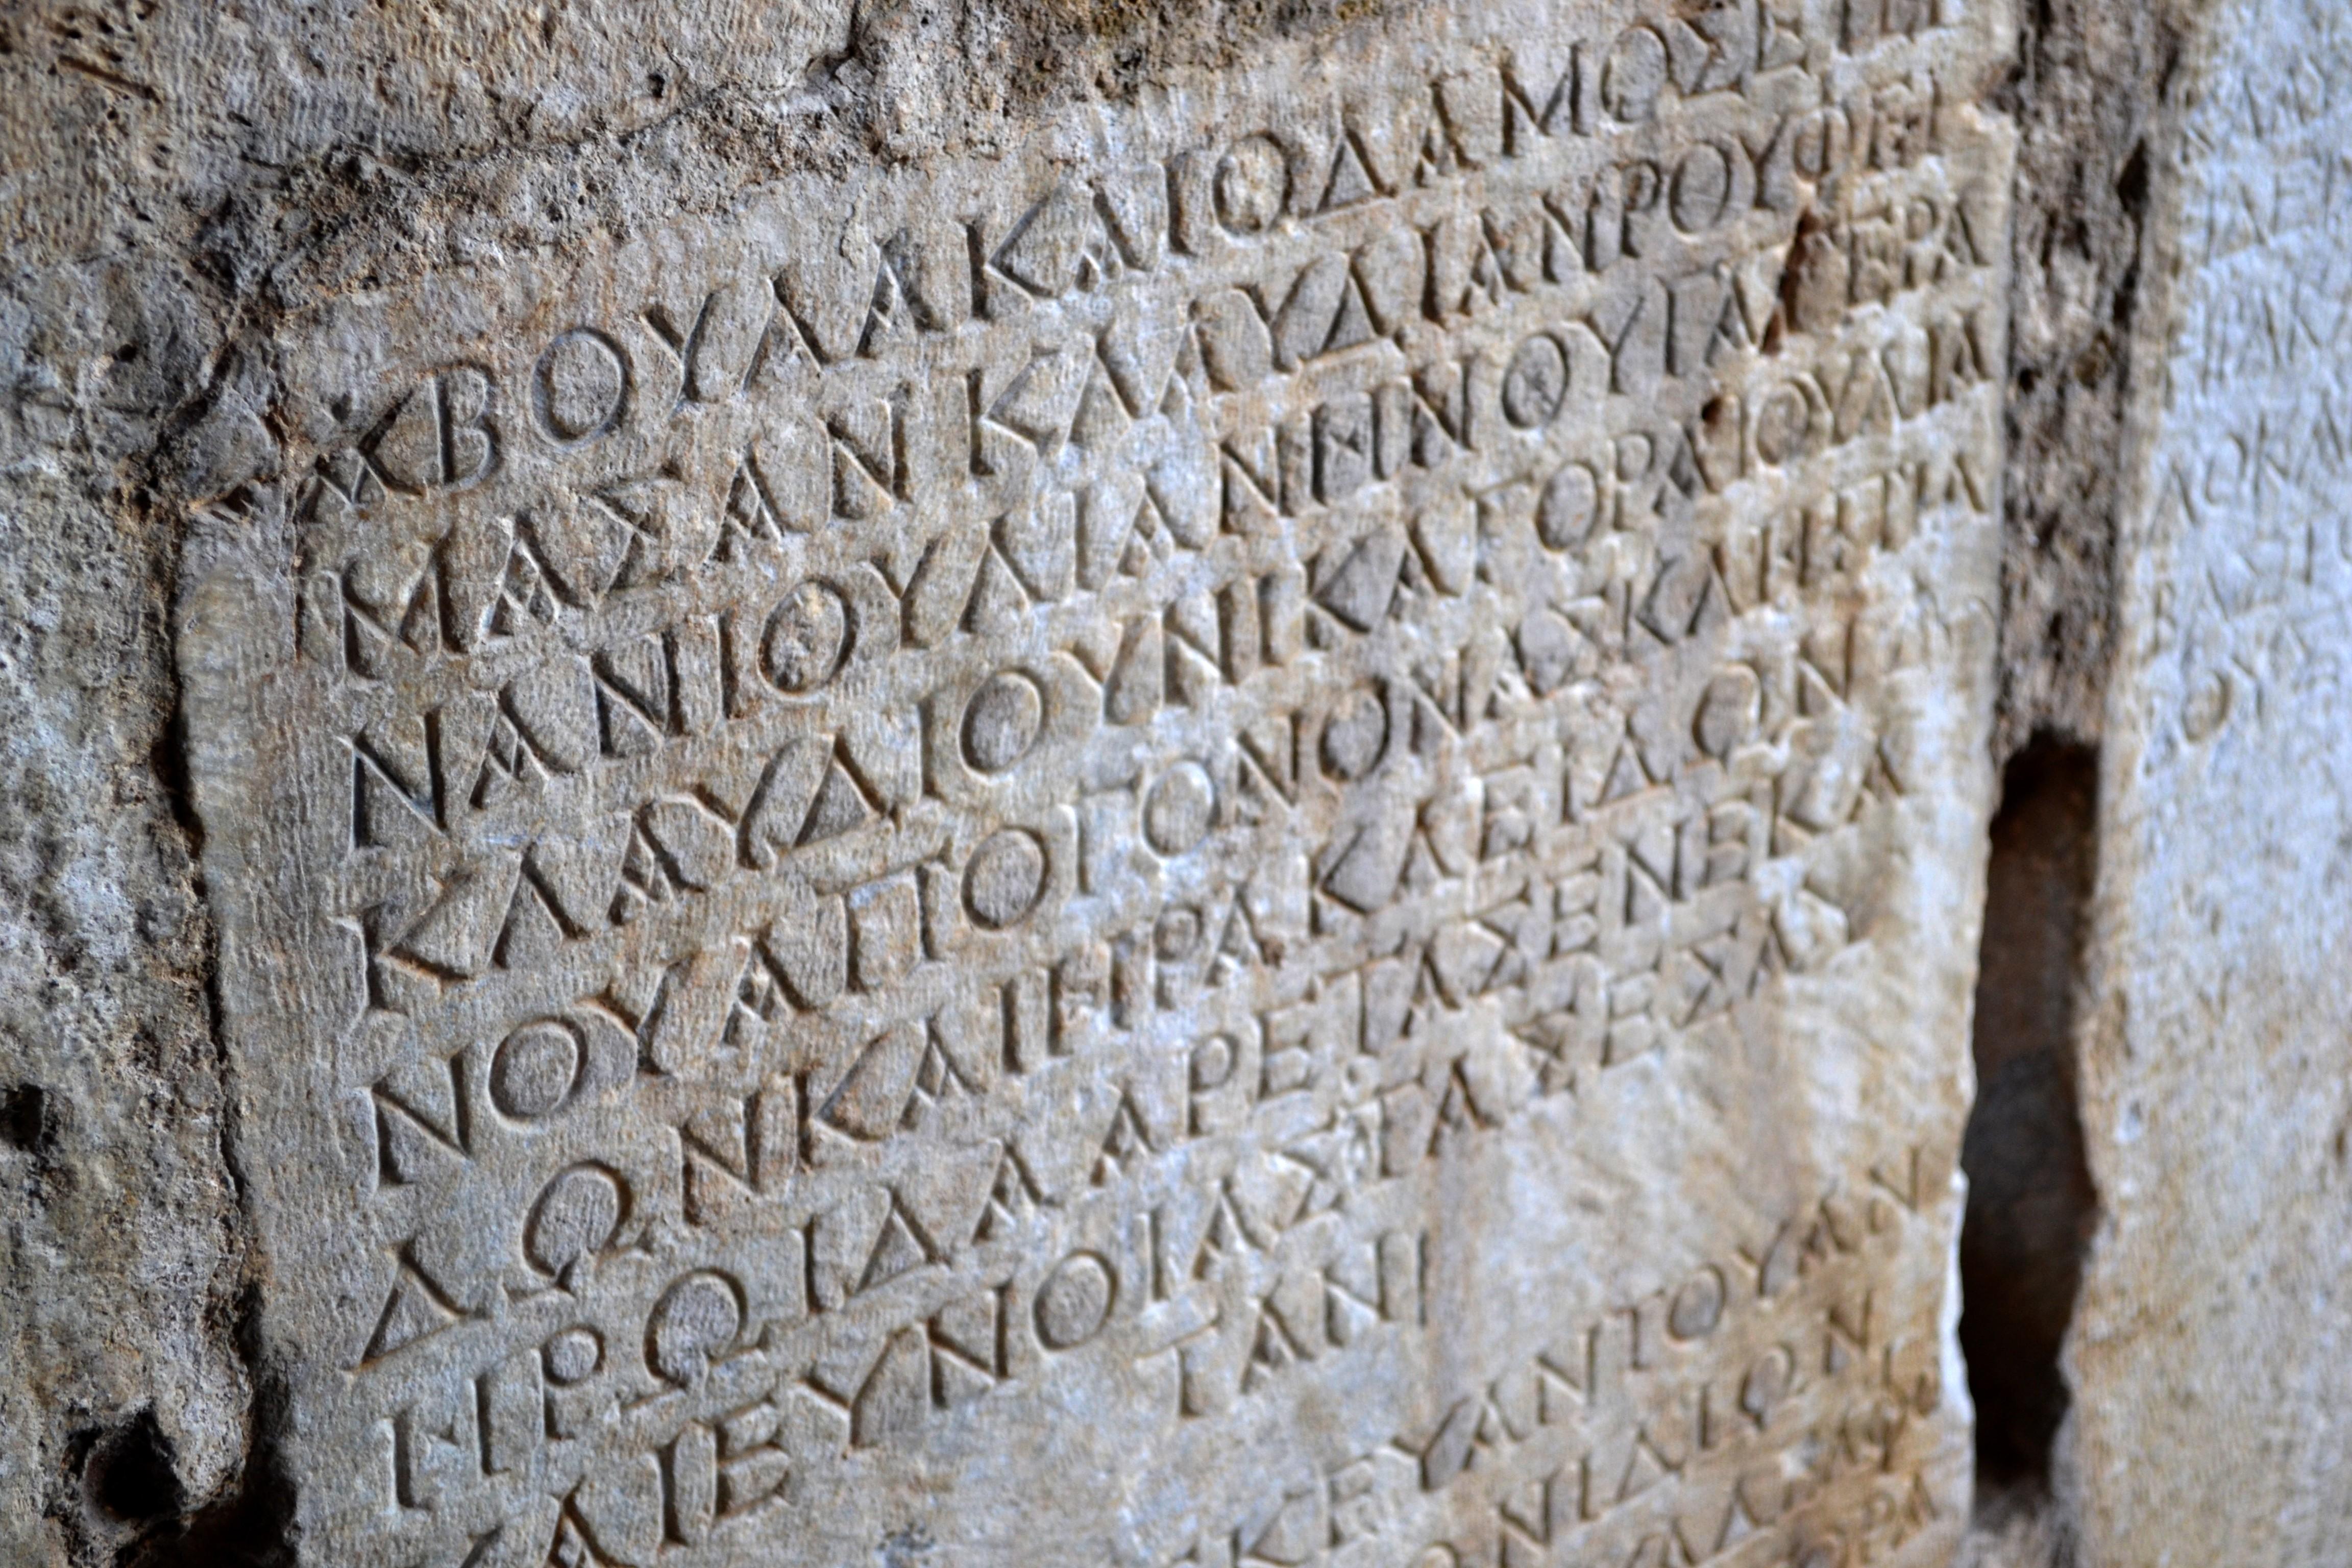 Картинки с древними текстами